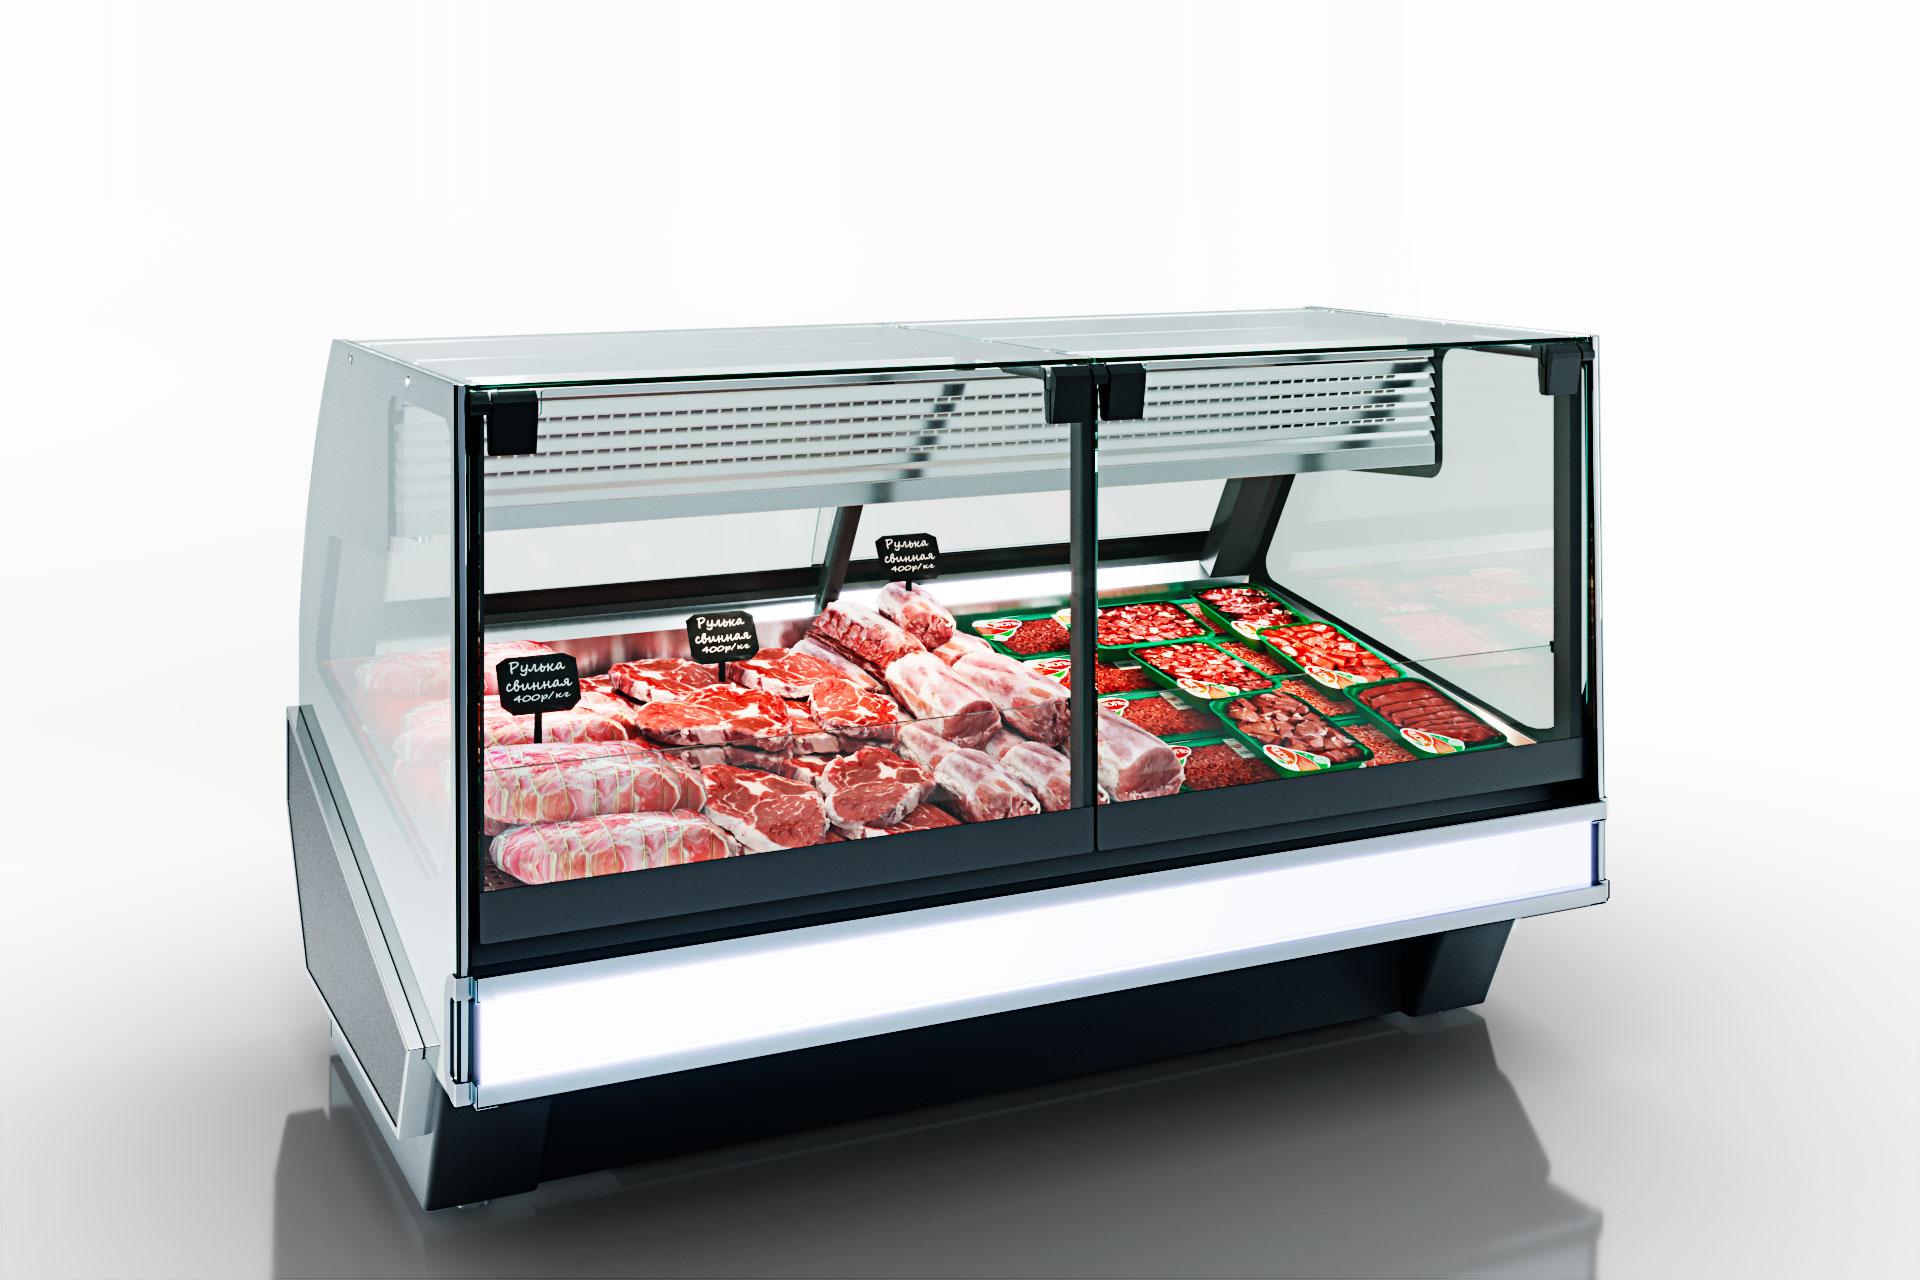 Missouri cold diamond MC 115 meat PS 121-SLM